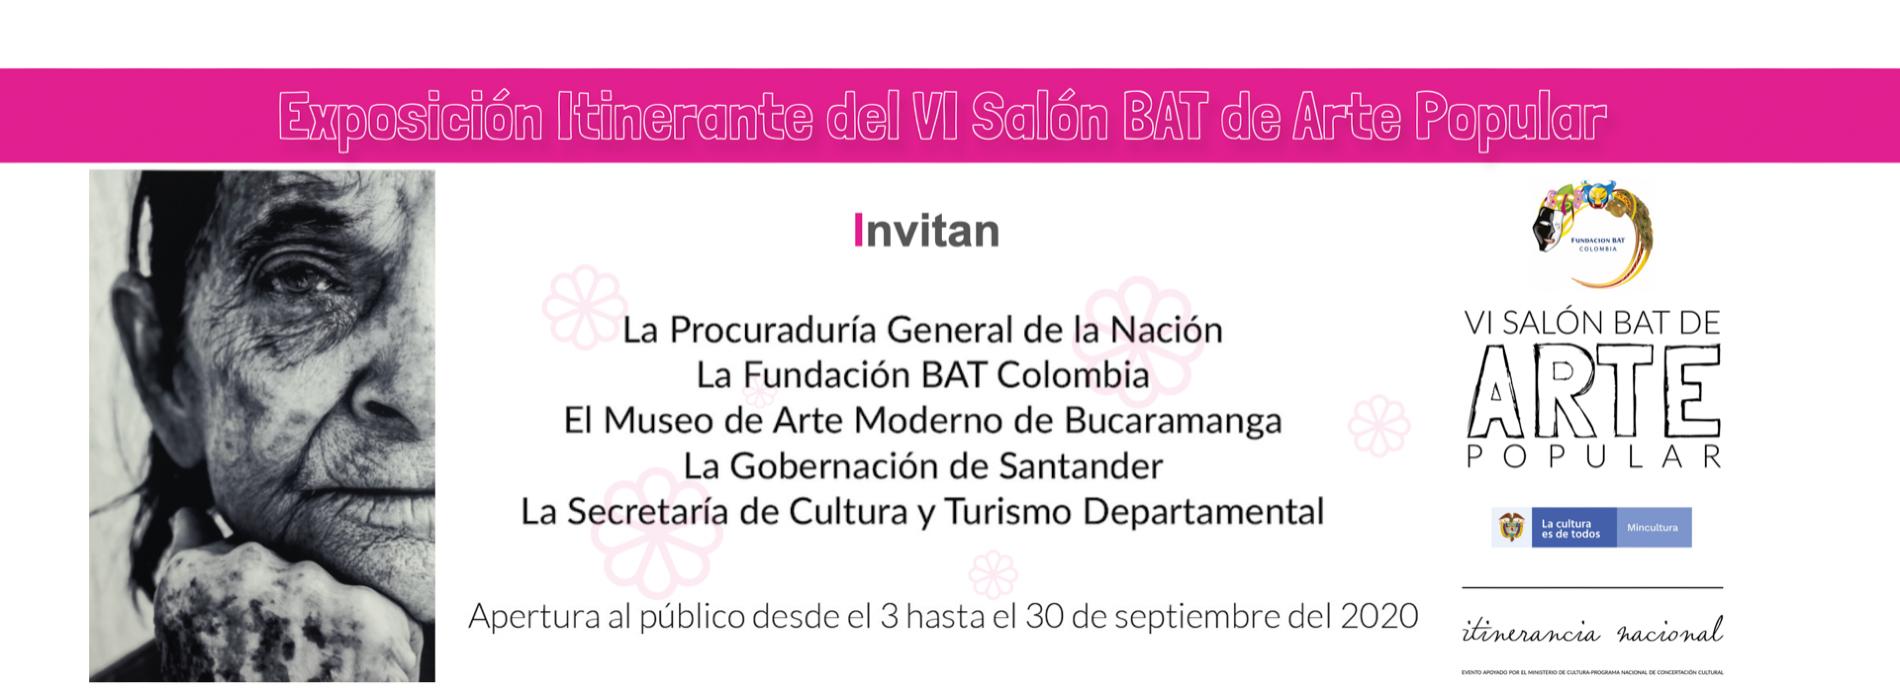 Banner itinerancia bucaramanga